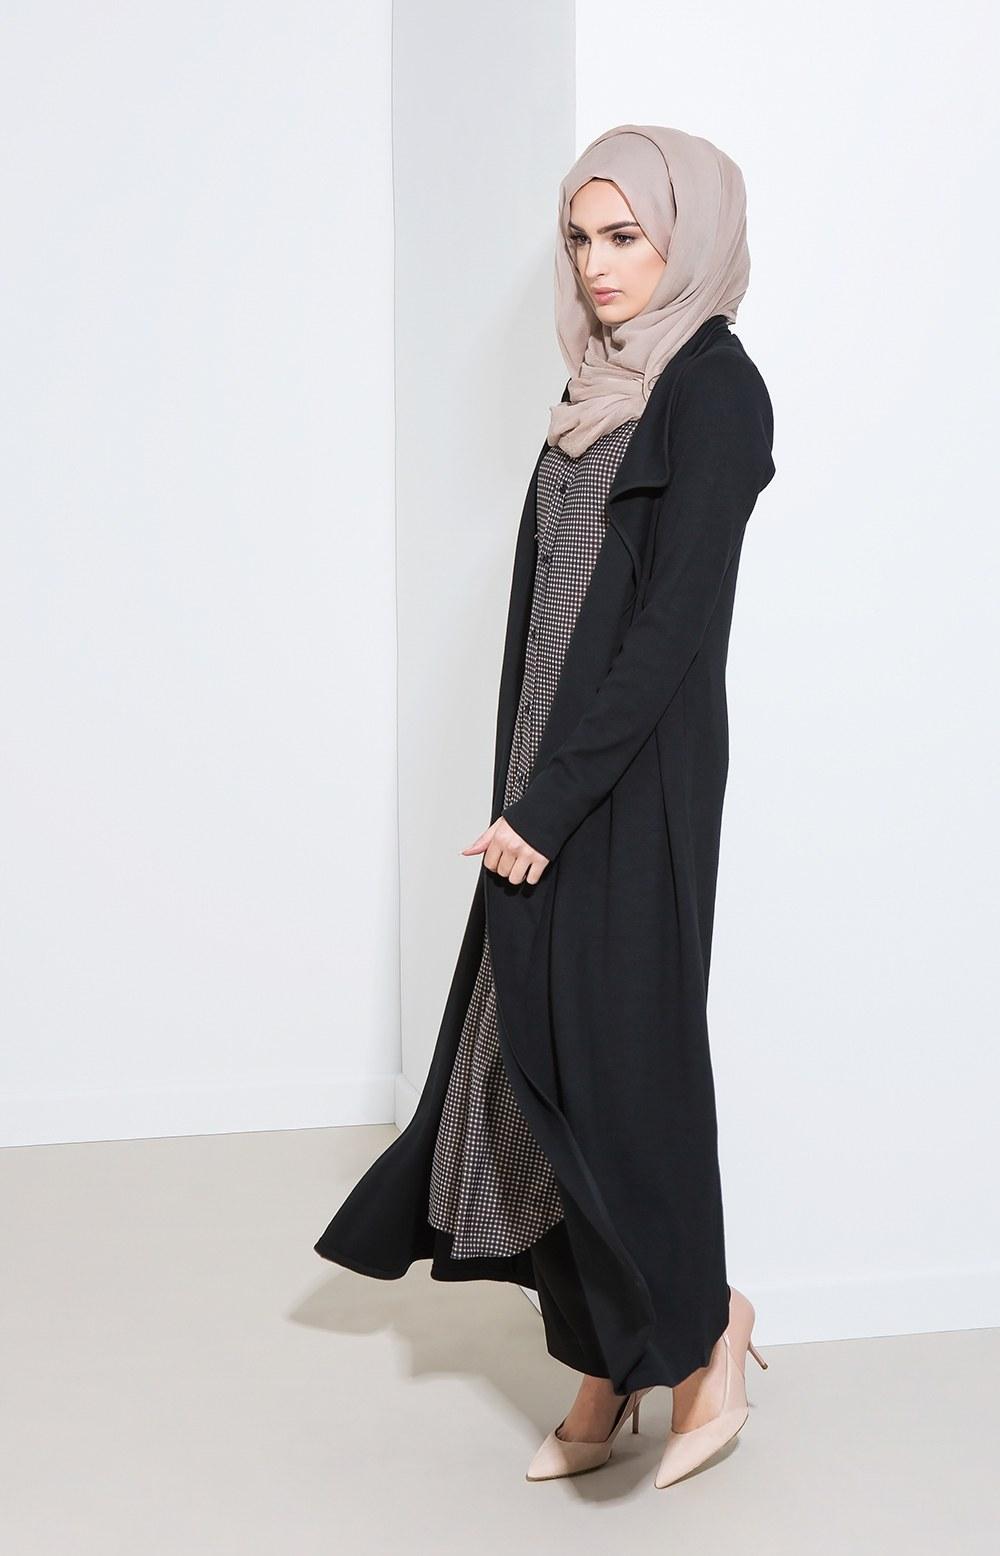 Inspirasi Model Baju Lebaran 0gdr 25 Trend Model Baju Muslim Lebaran 2018 Simple & Modis